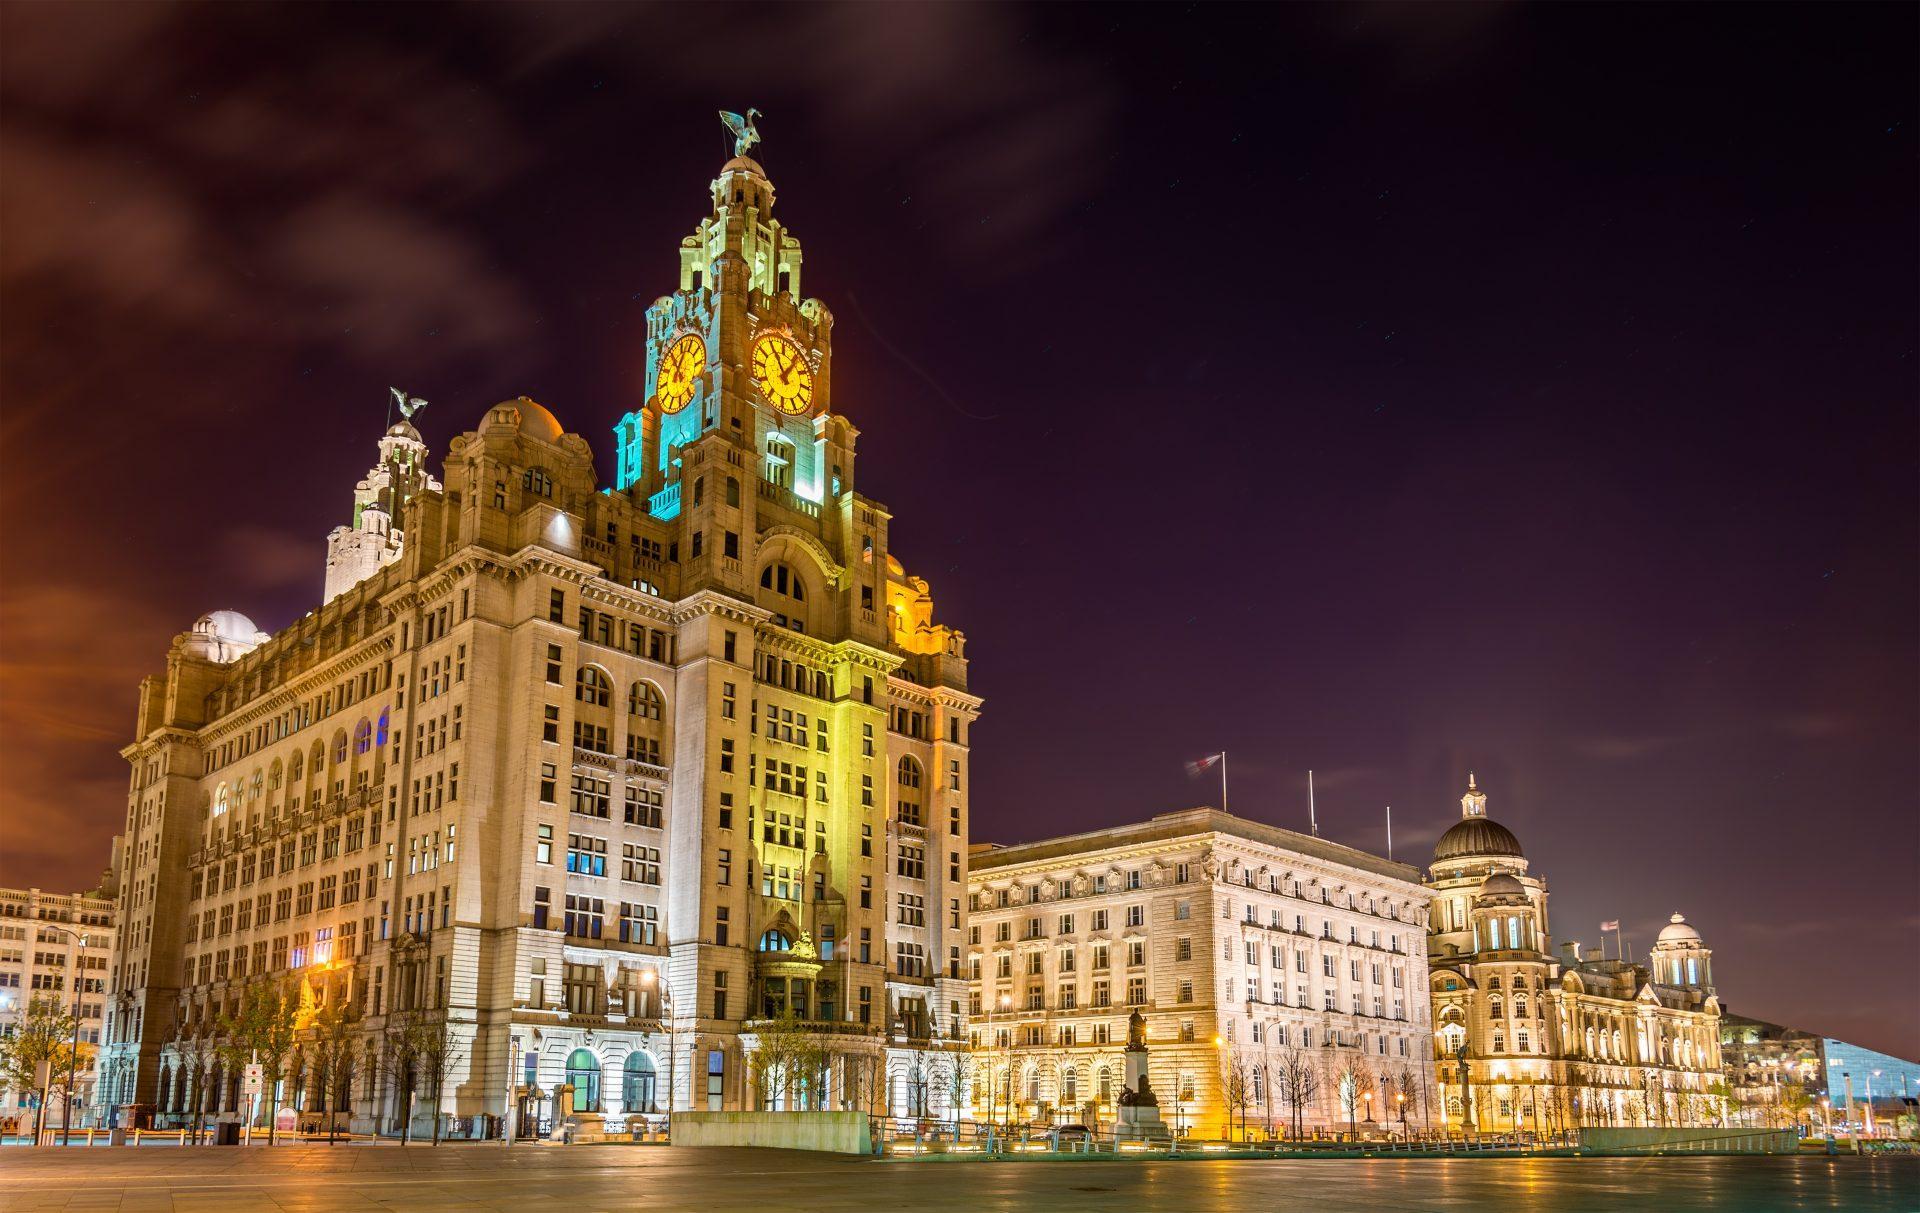 The Royal Liver Building, Liverpool, England